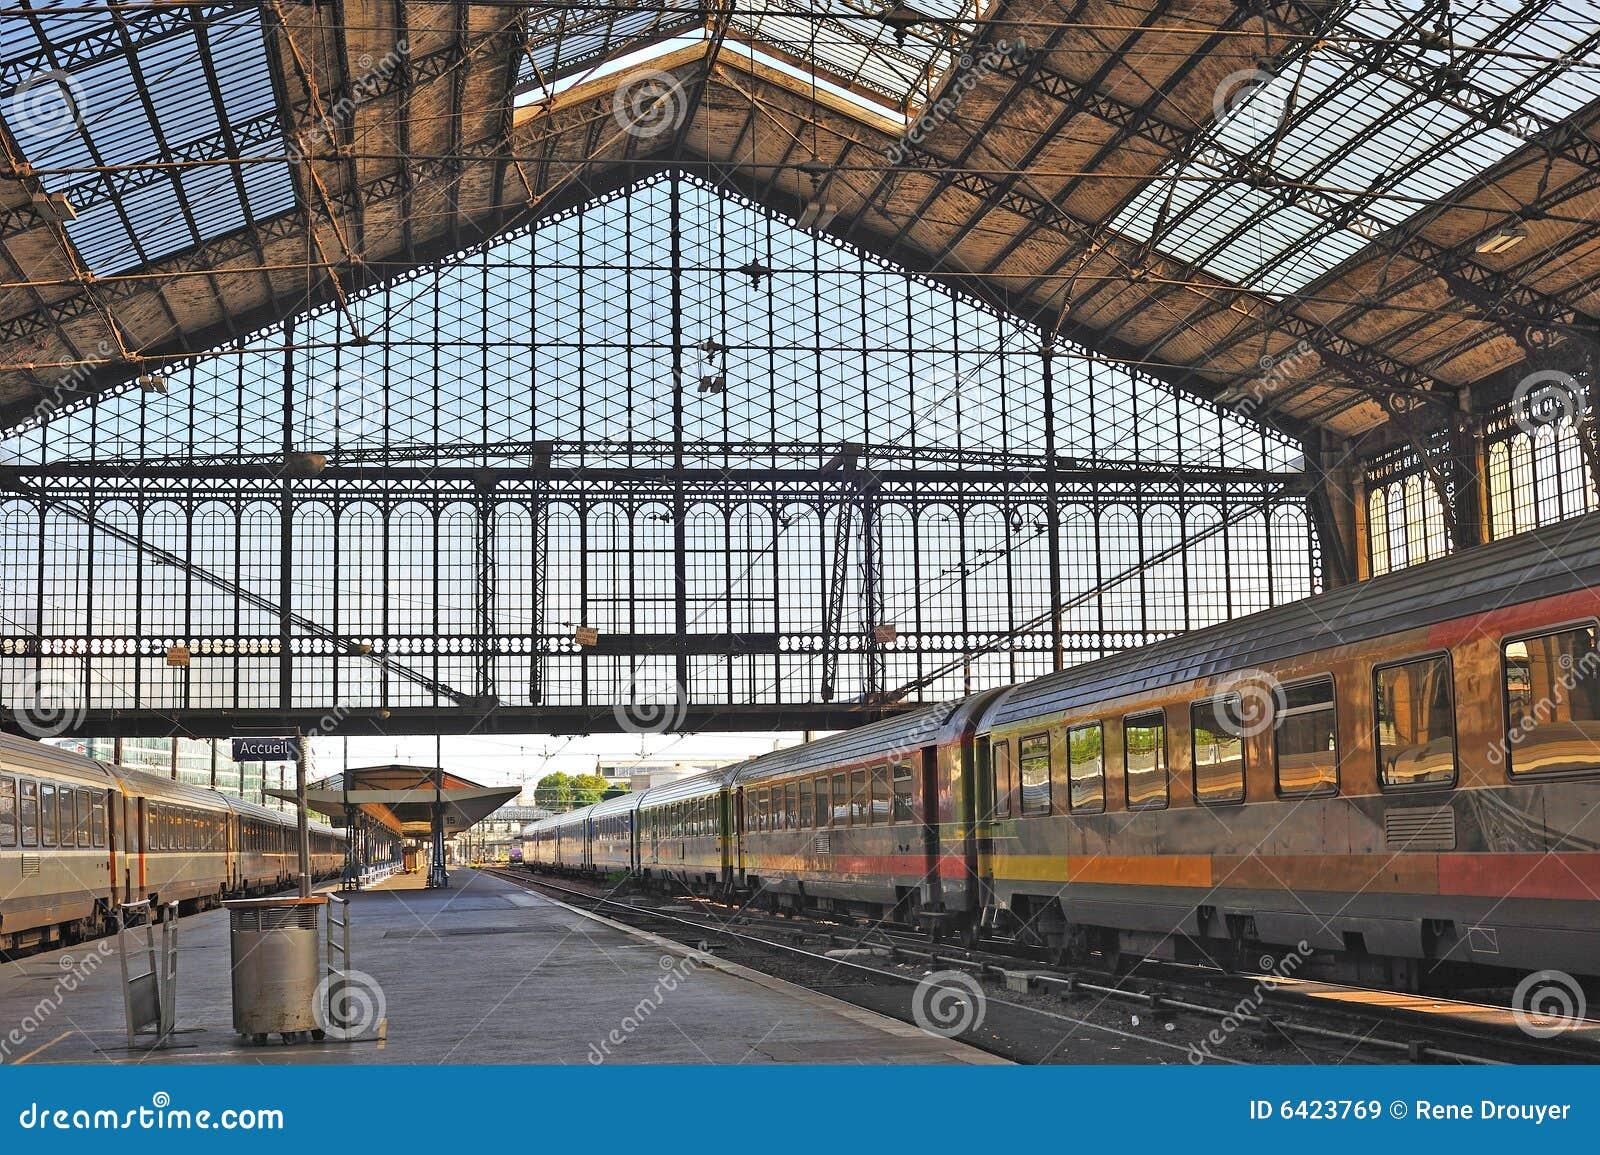 travel parisfrancerailwaystations